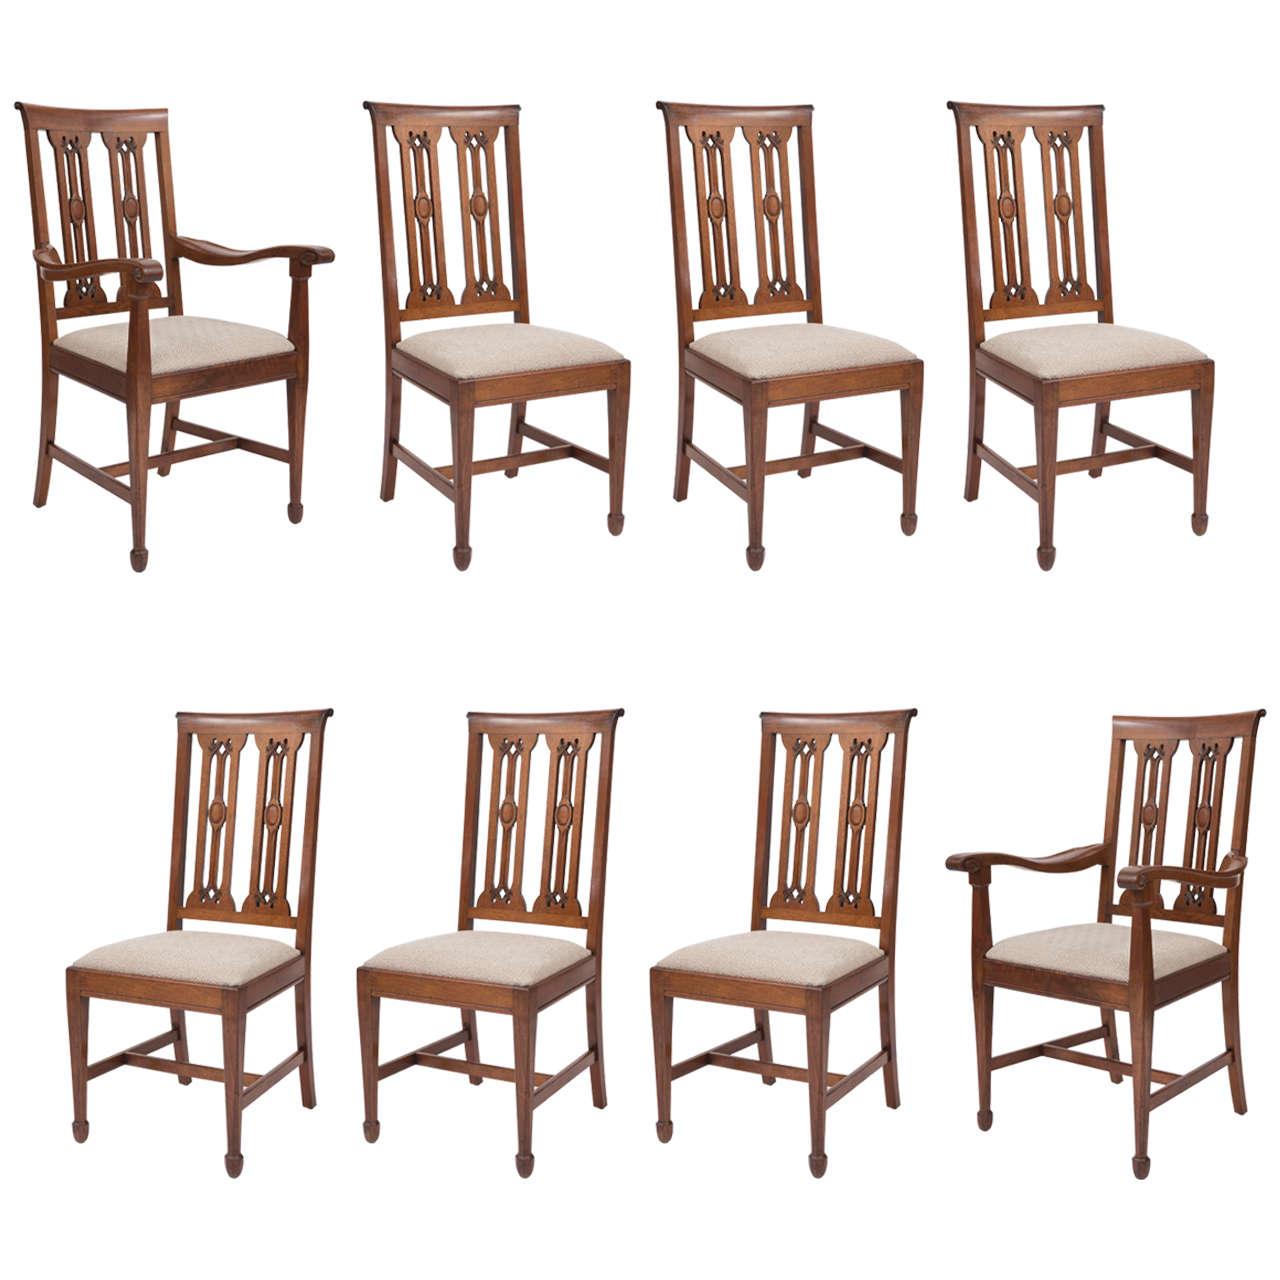 Arthur Simpson of Kendal, set of eight walnut dining chairs, England circa  1915